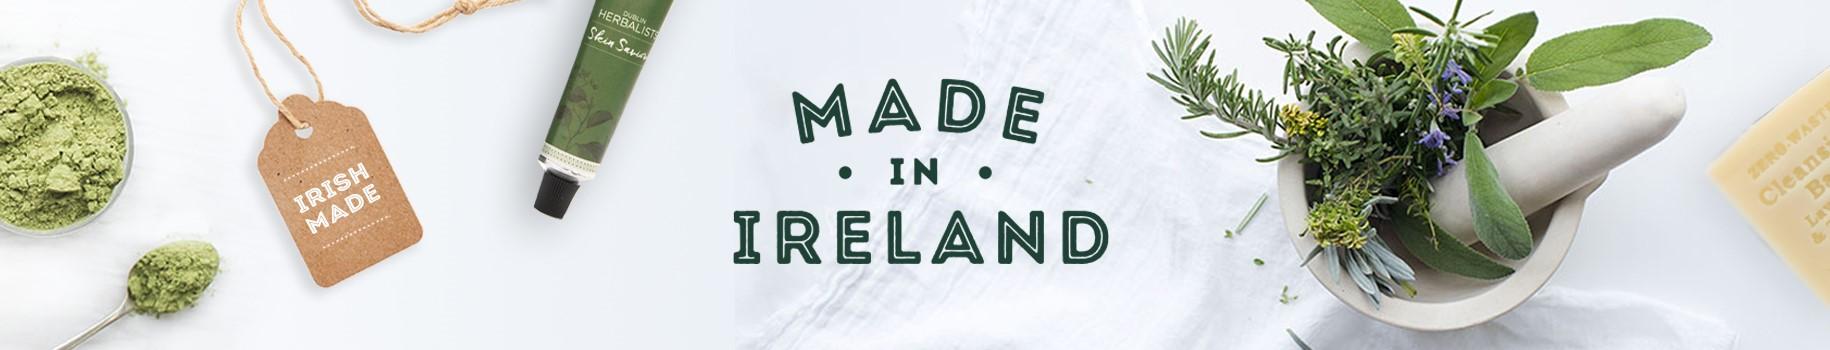 Nourish Made in Ireland - Food